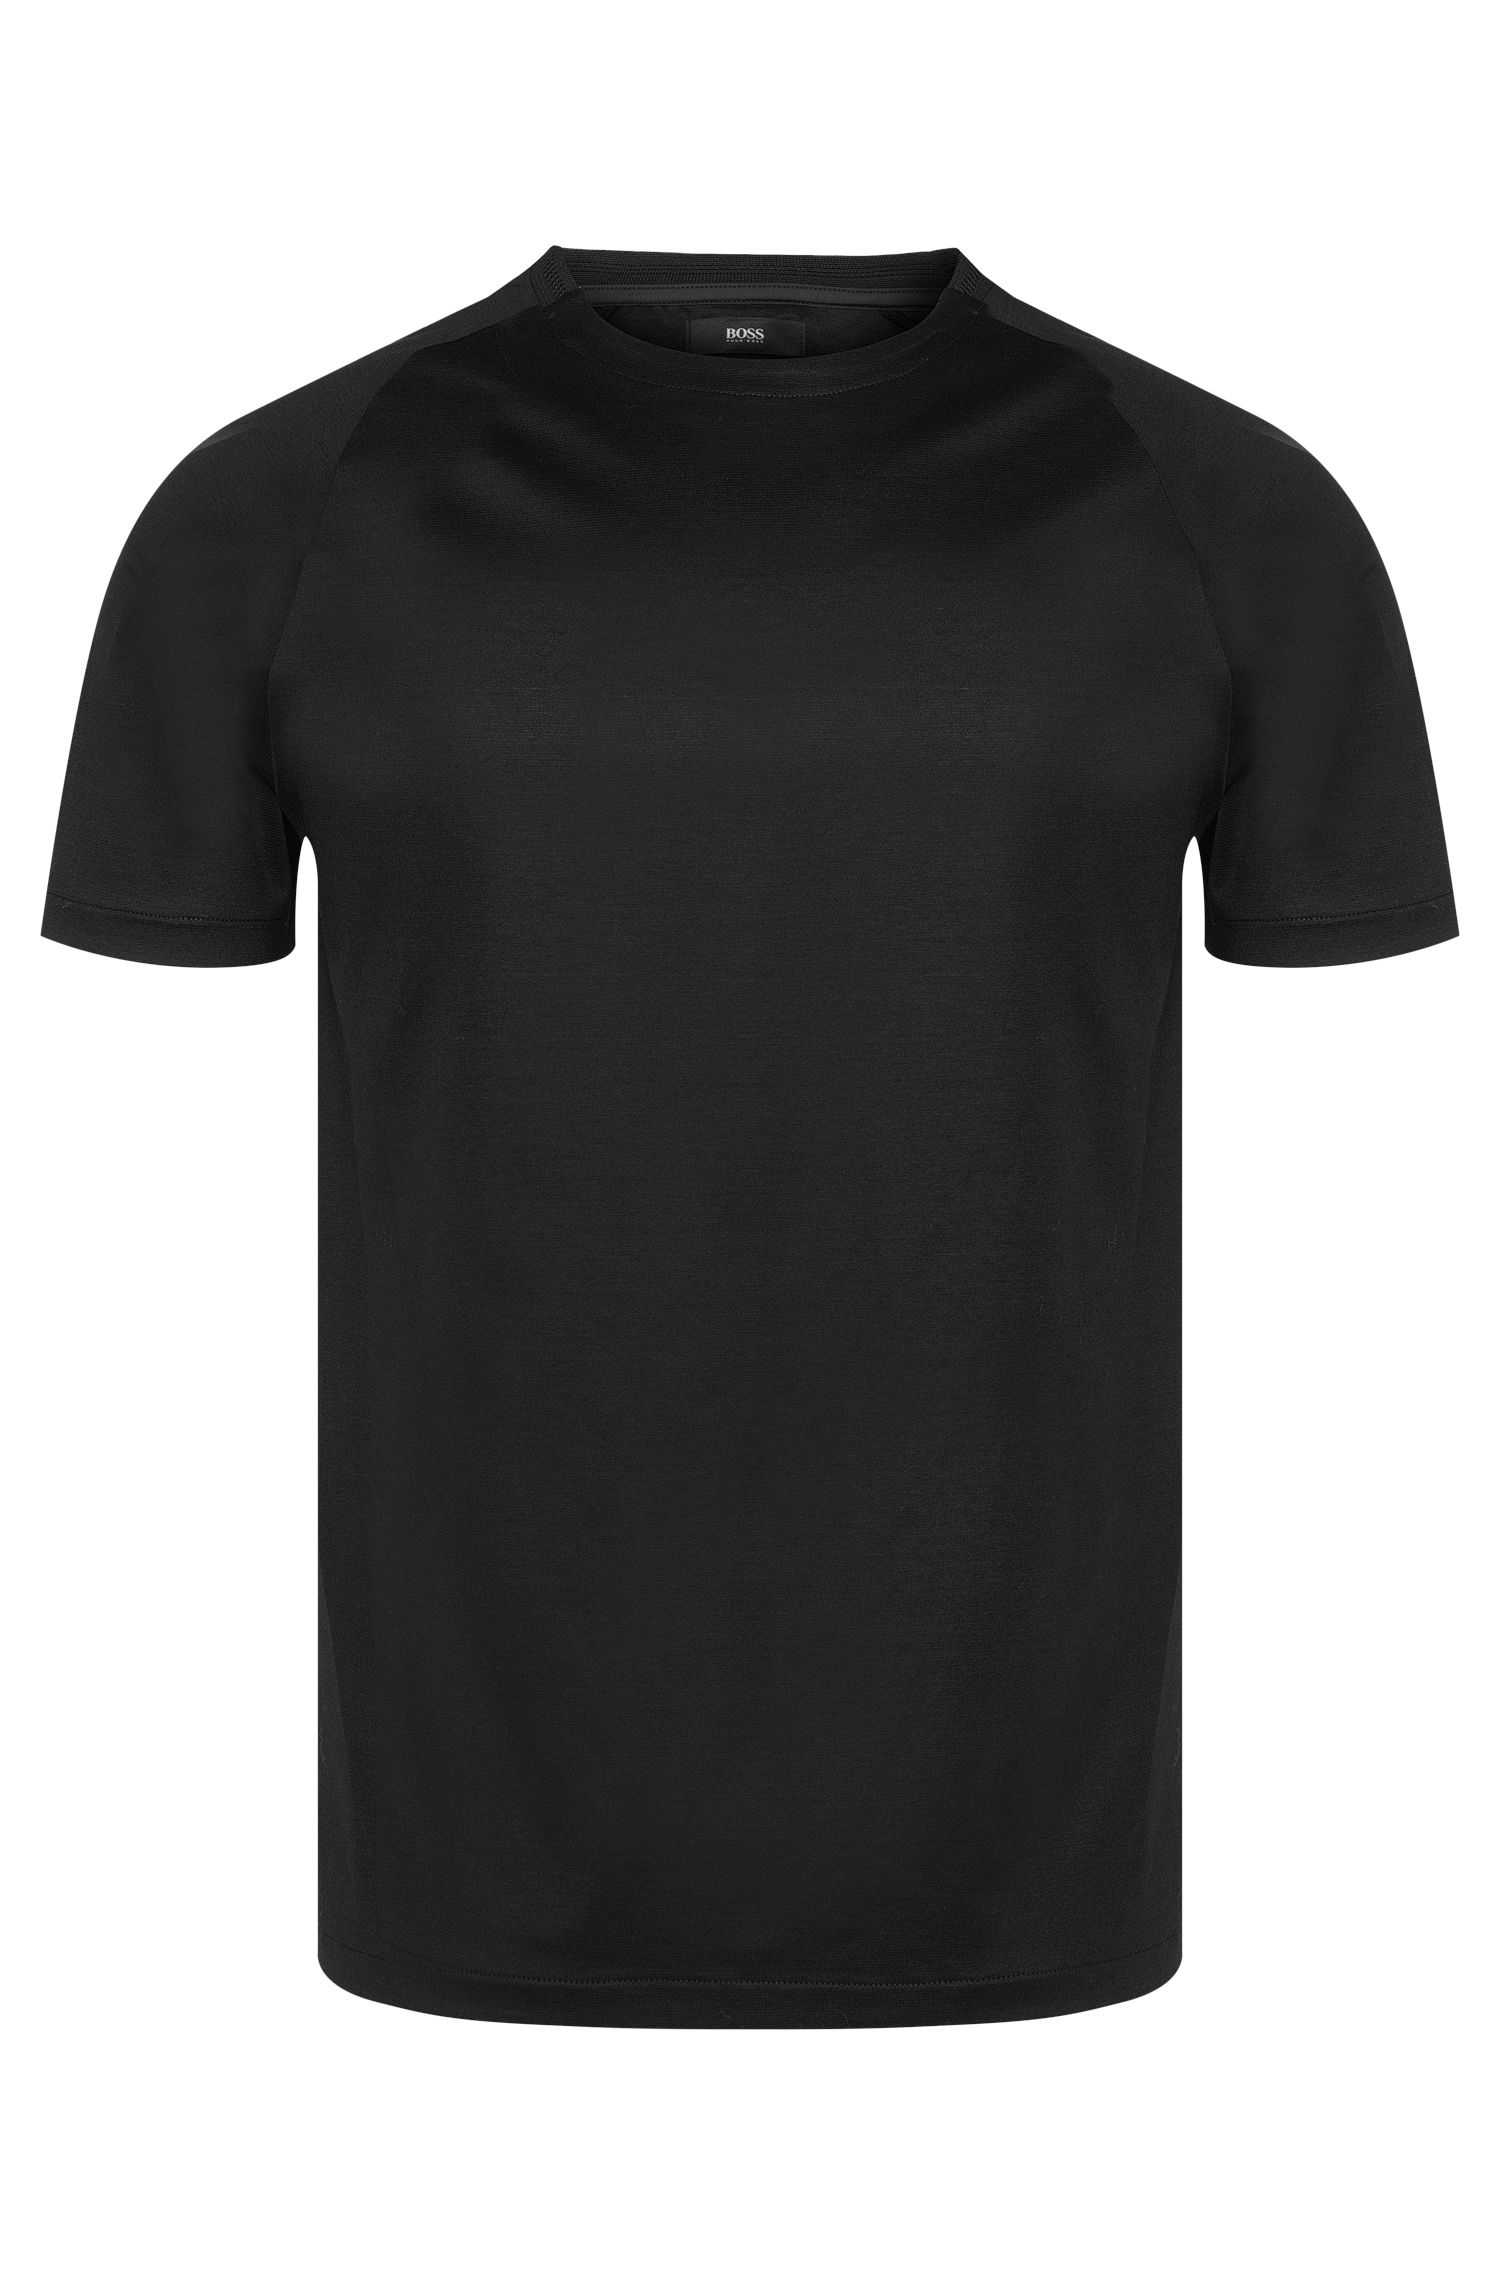 'Tessler' | Mercerized Stertch Cotton T-Shirt